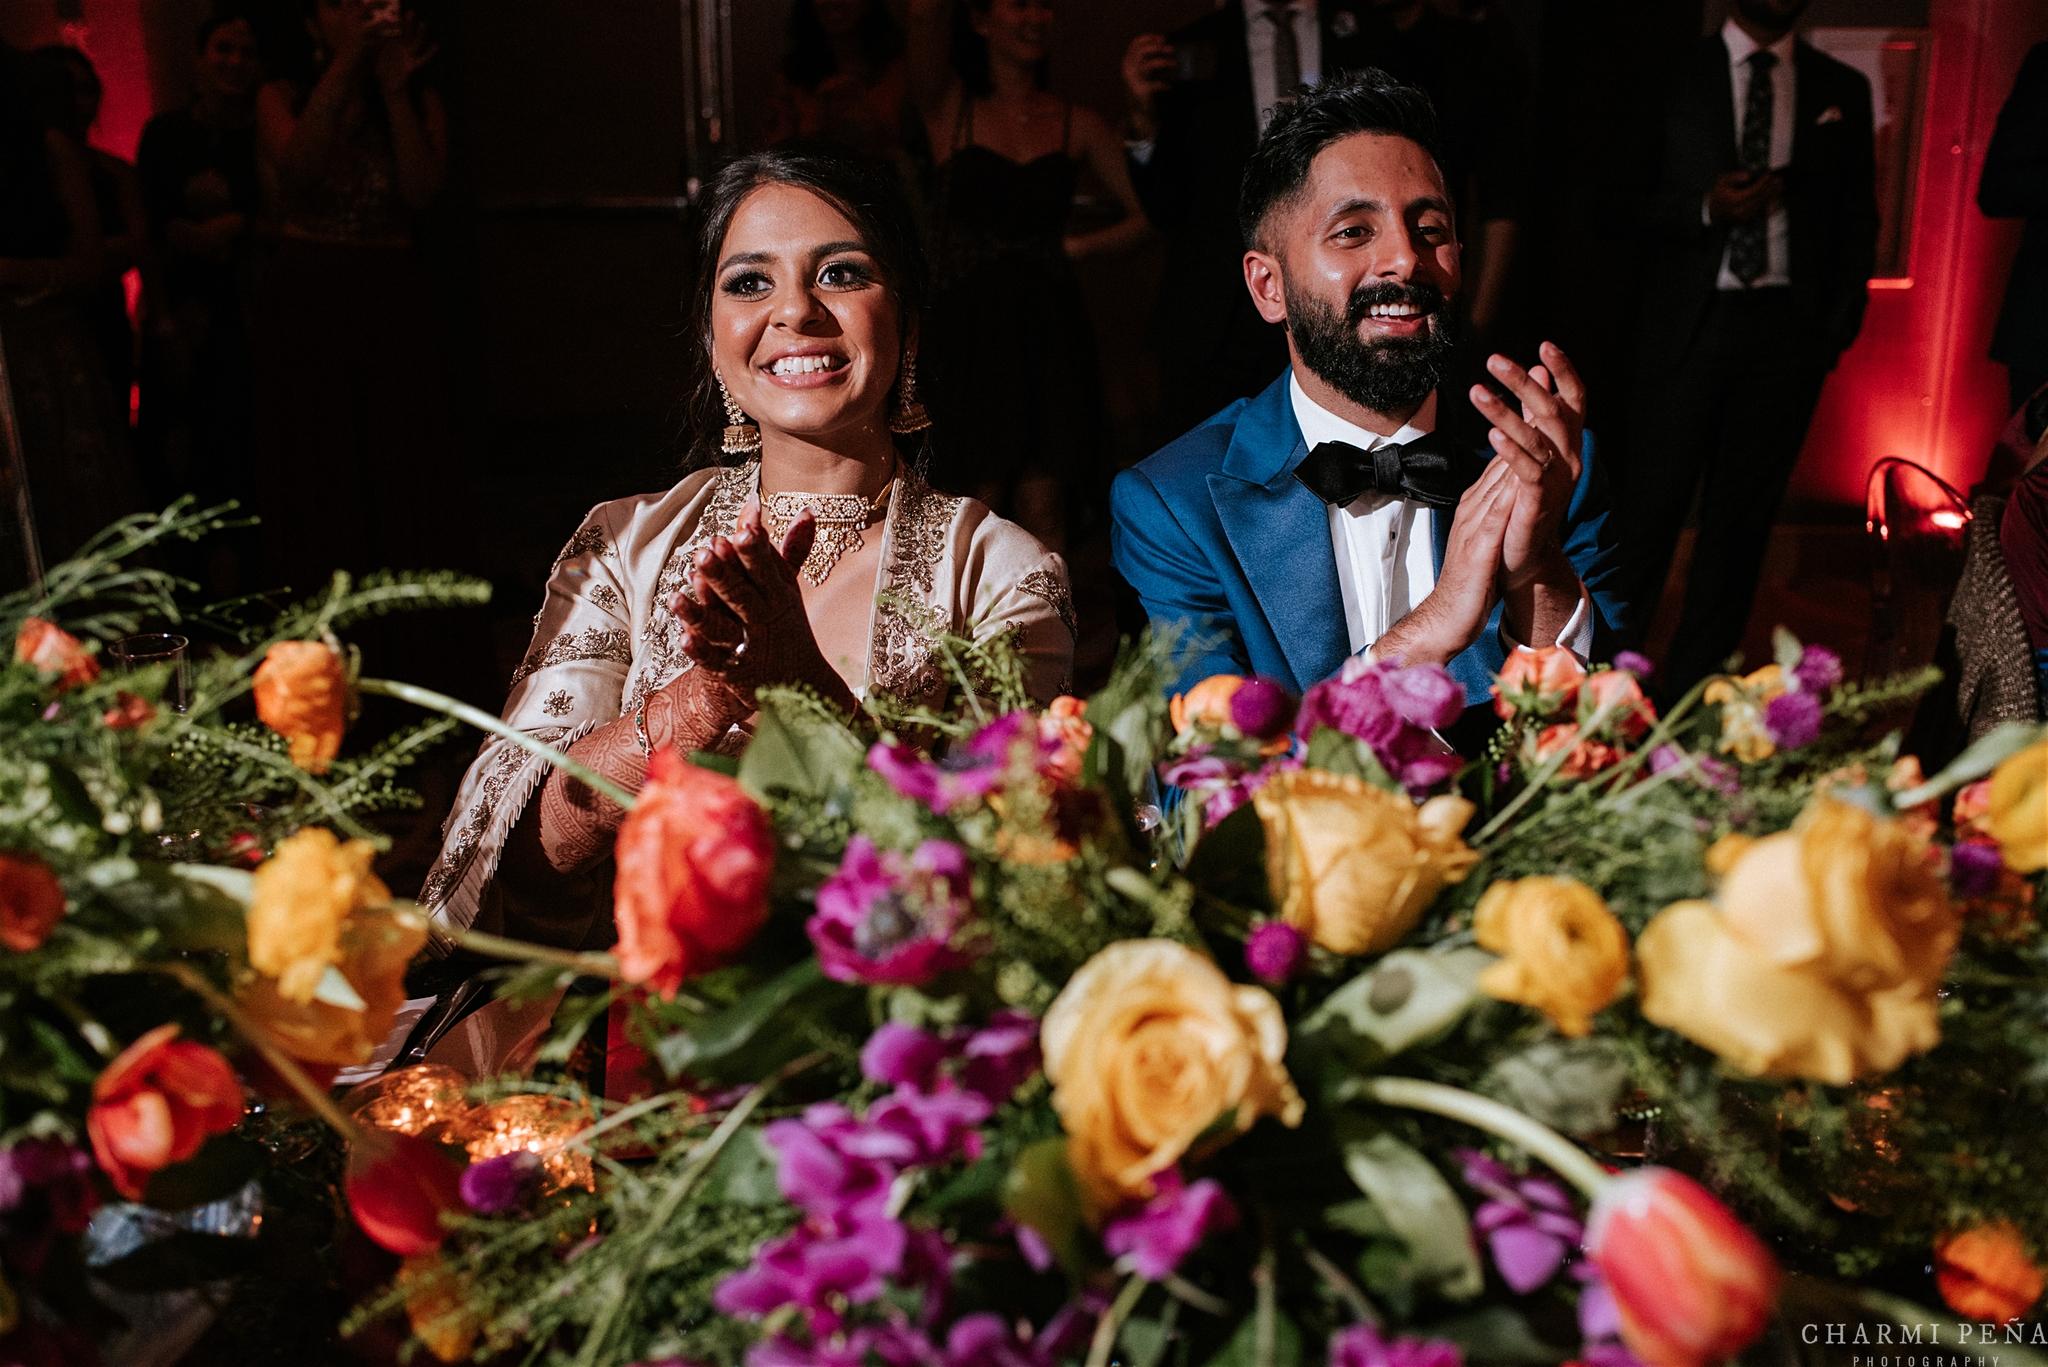 INDIAN WEDDING RECEPTION BRIDE AND GROOM2.jpg